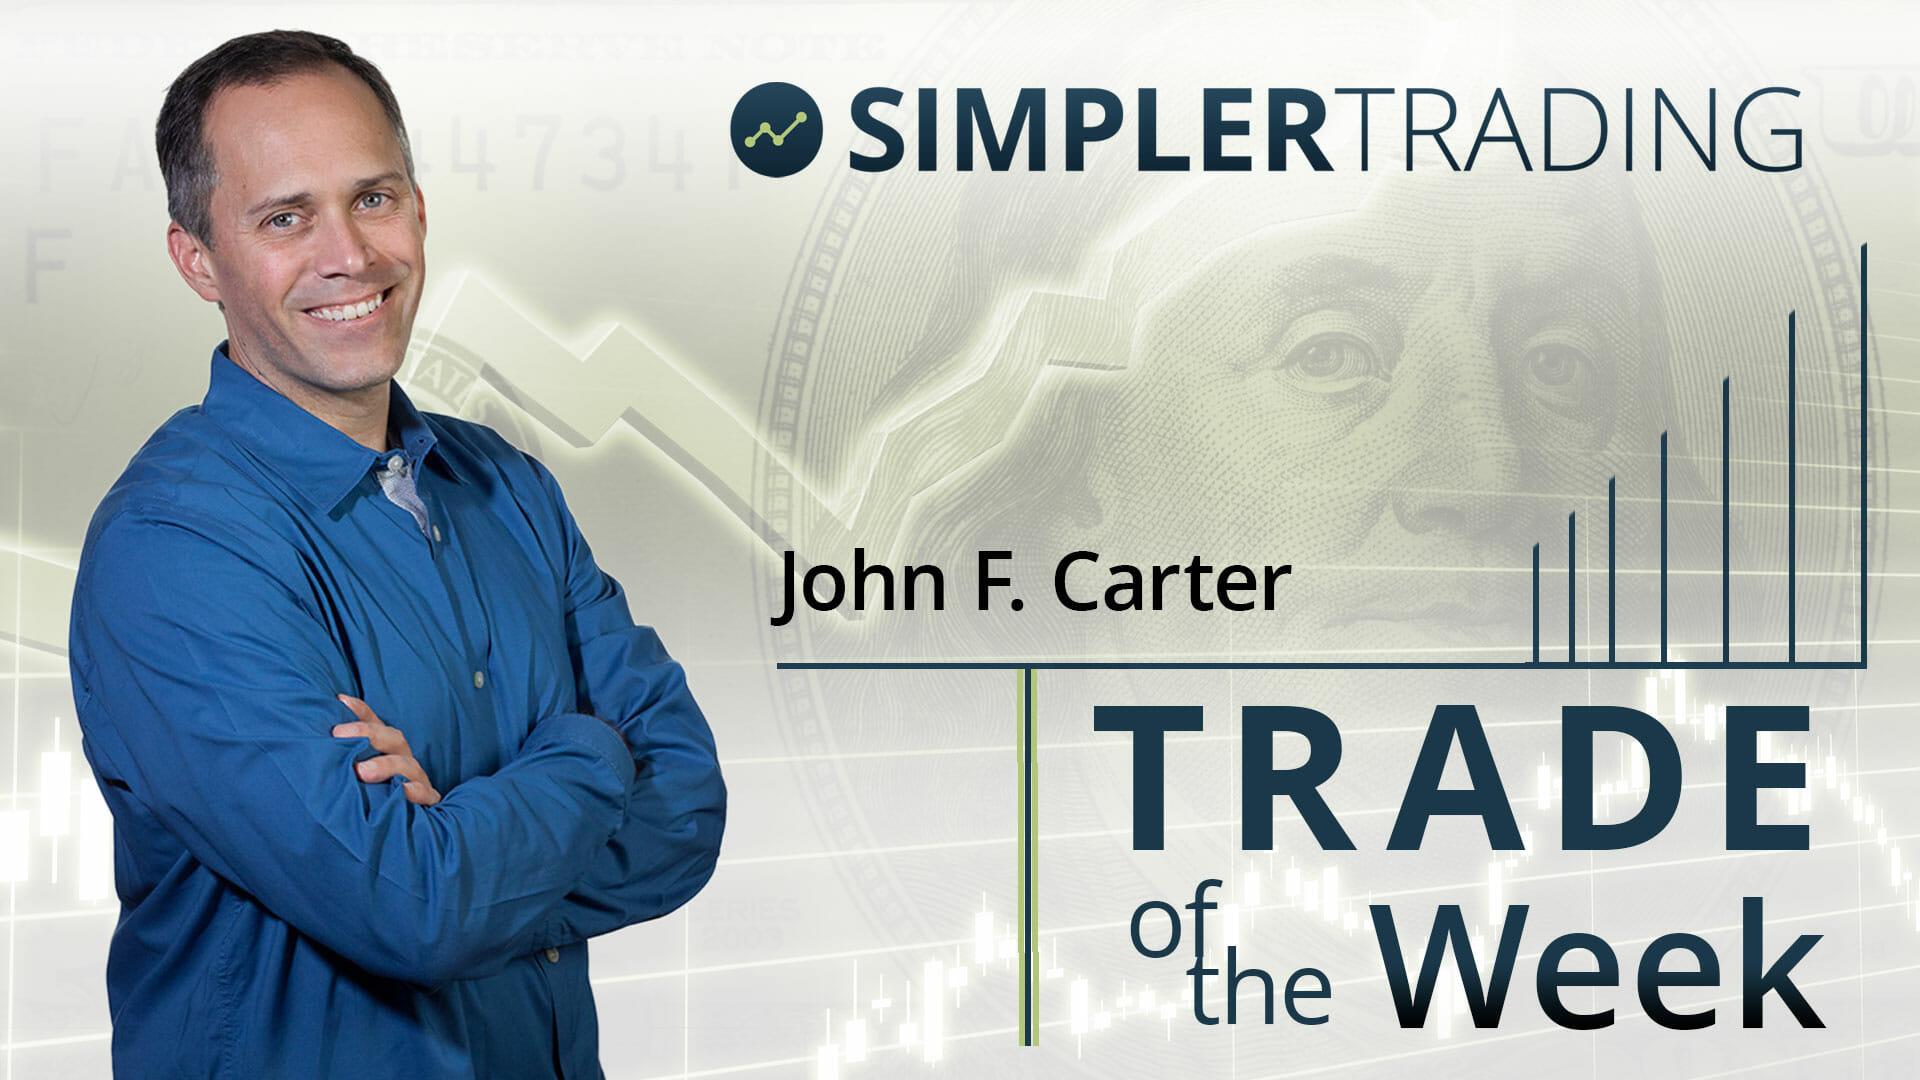 Trade of the Week John F. Carter